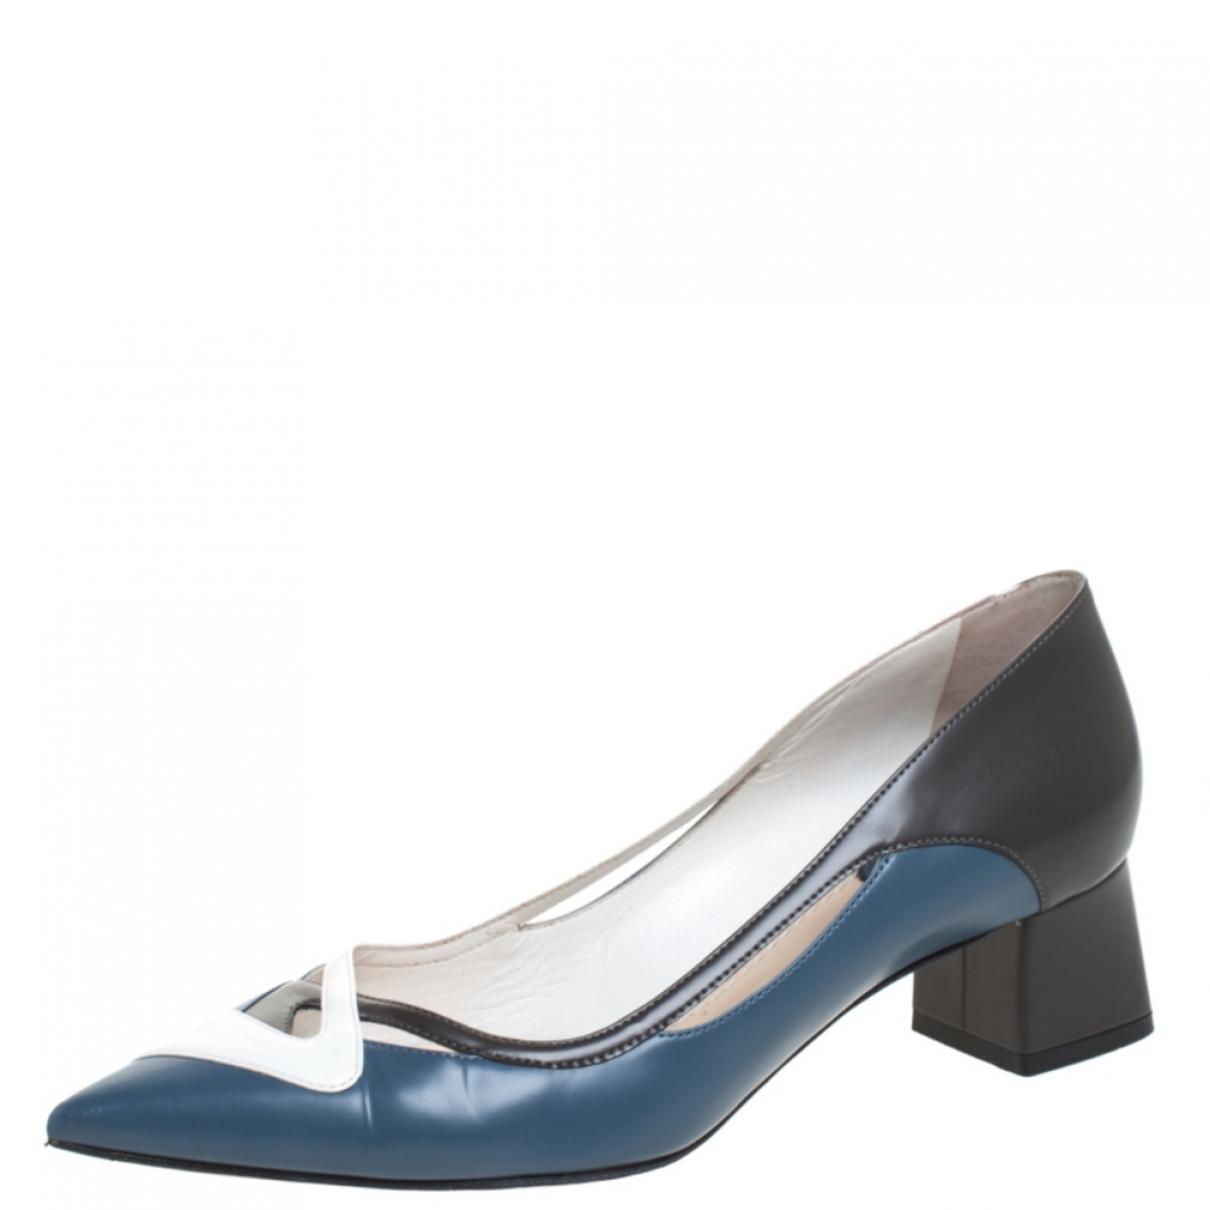 Dior - Escarpins   pour femme en cuir - multicolore